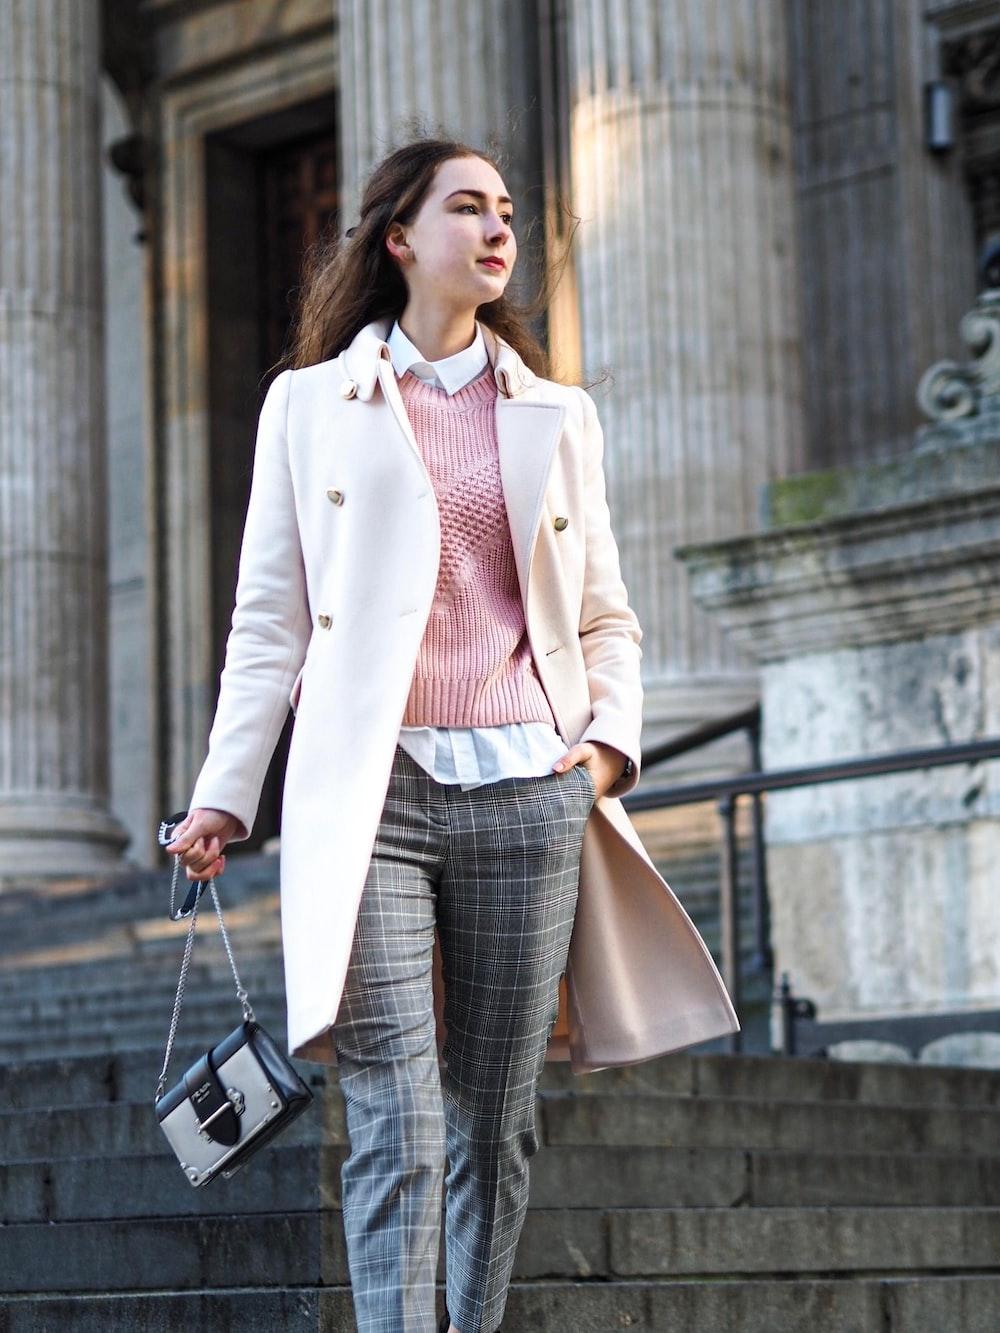 woman wearing white coat carrying crossbody bag